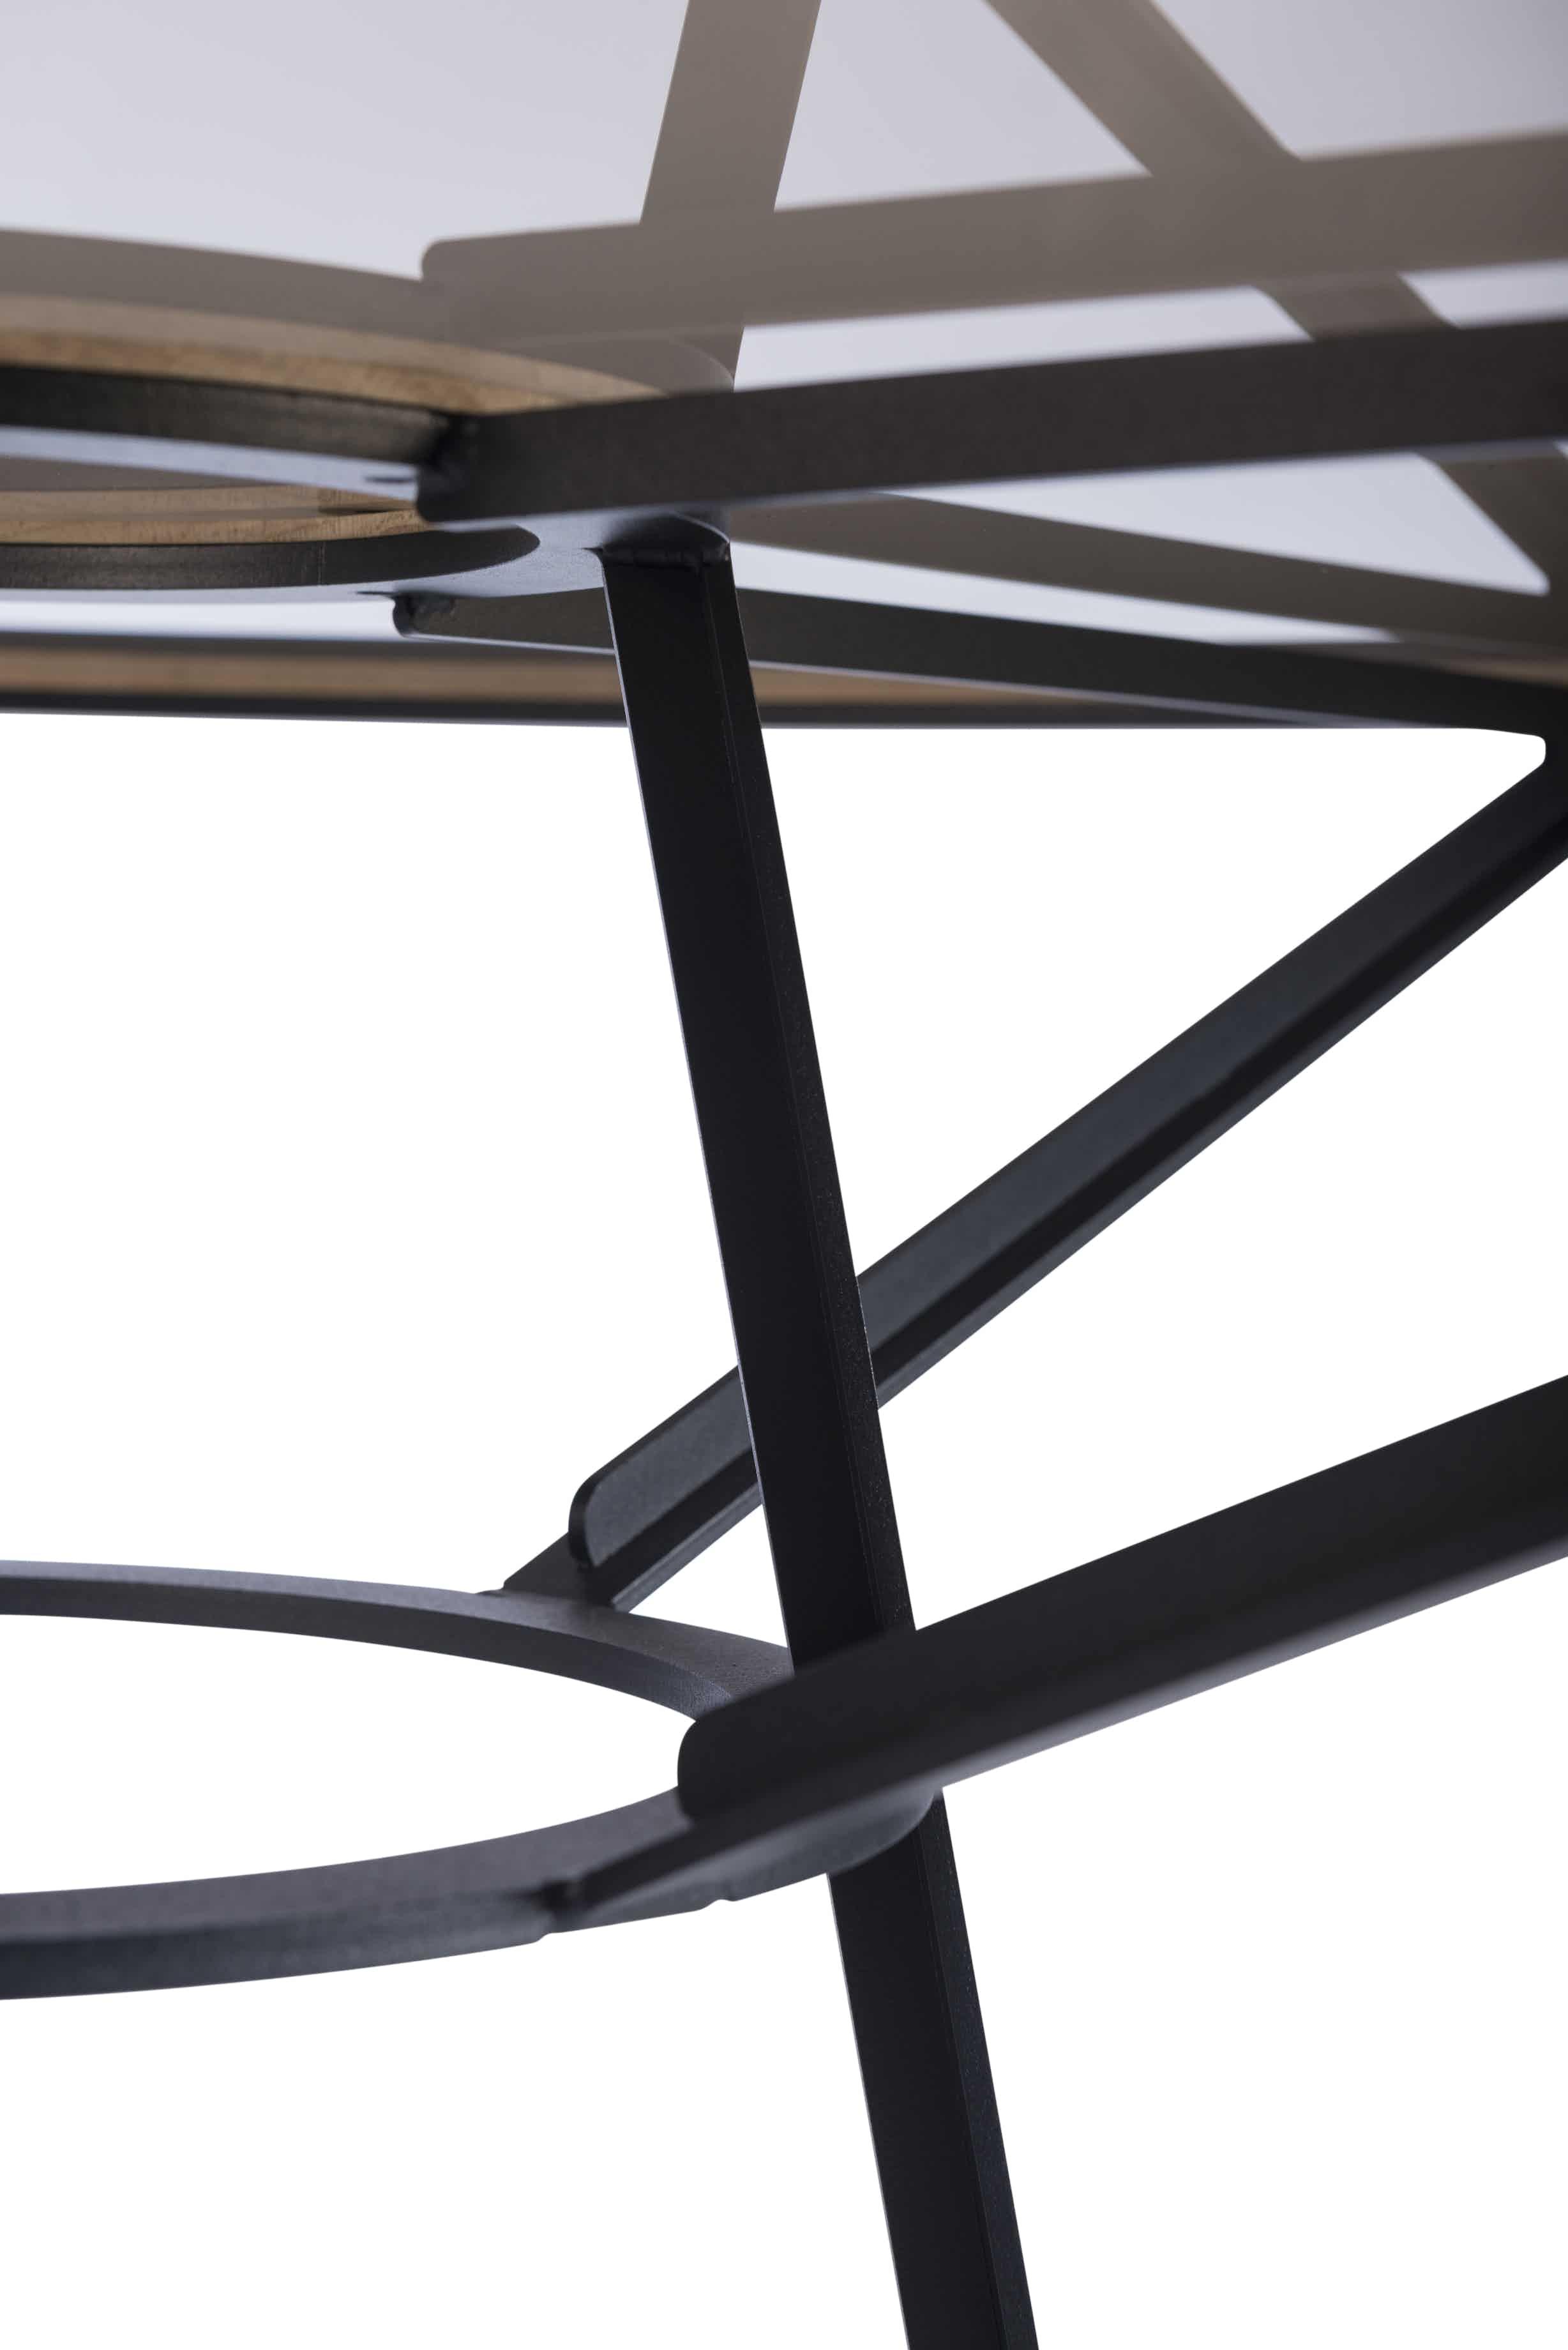 Spectrum Furniture Detail Endless Round Table Haute Living